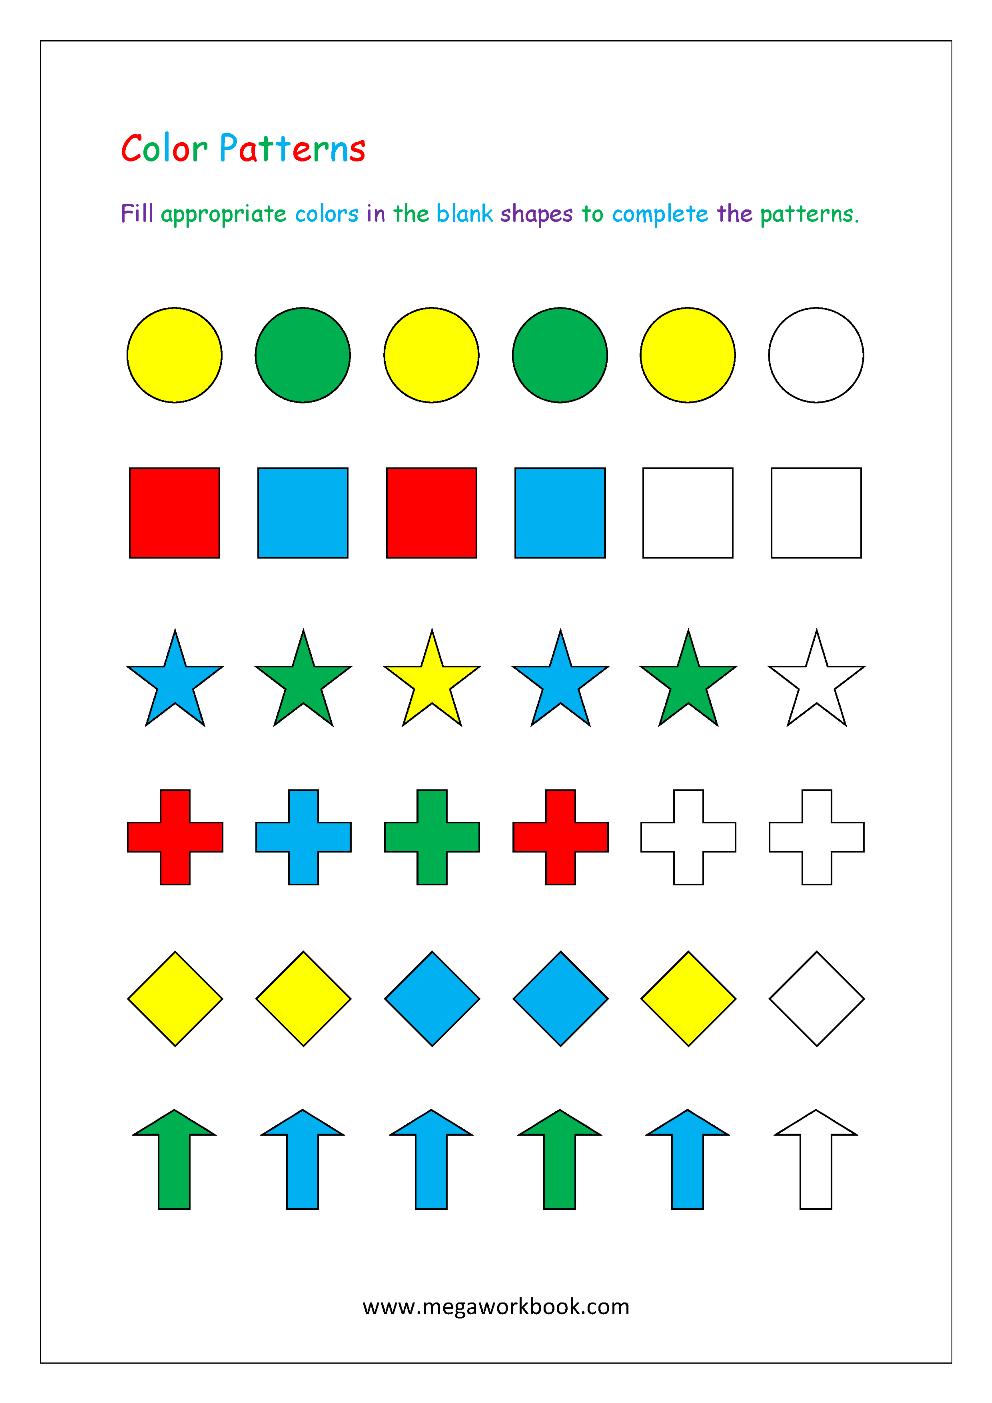 hight resolution of Pattern Worksheets For Kindergarten - Color Patterns - Growing Patterns -  Decreasing Patterns - Repeating Patterns Worksheets - AB